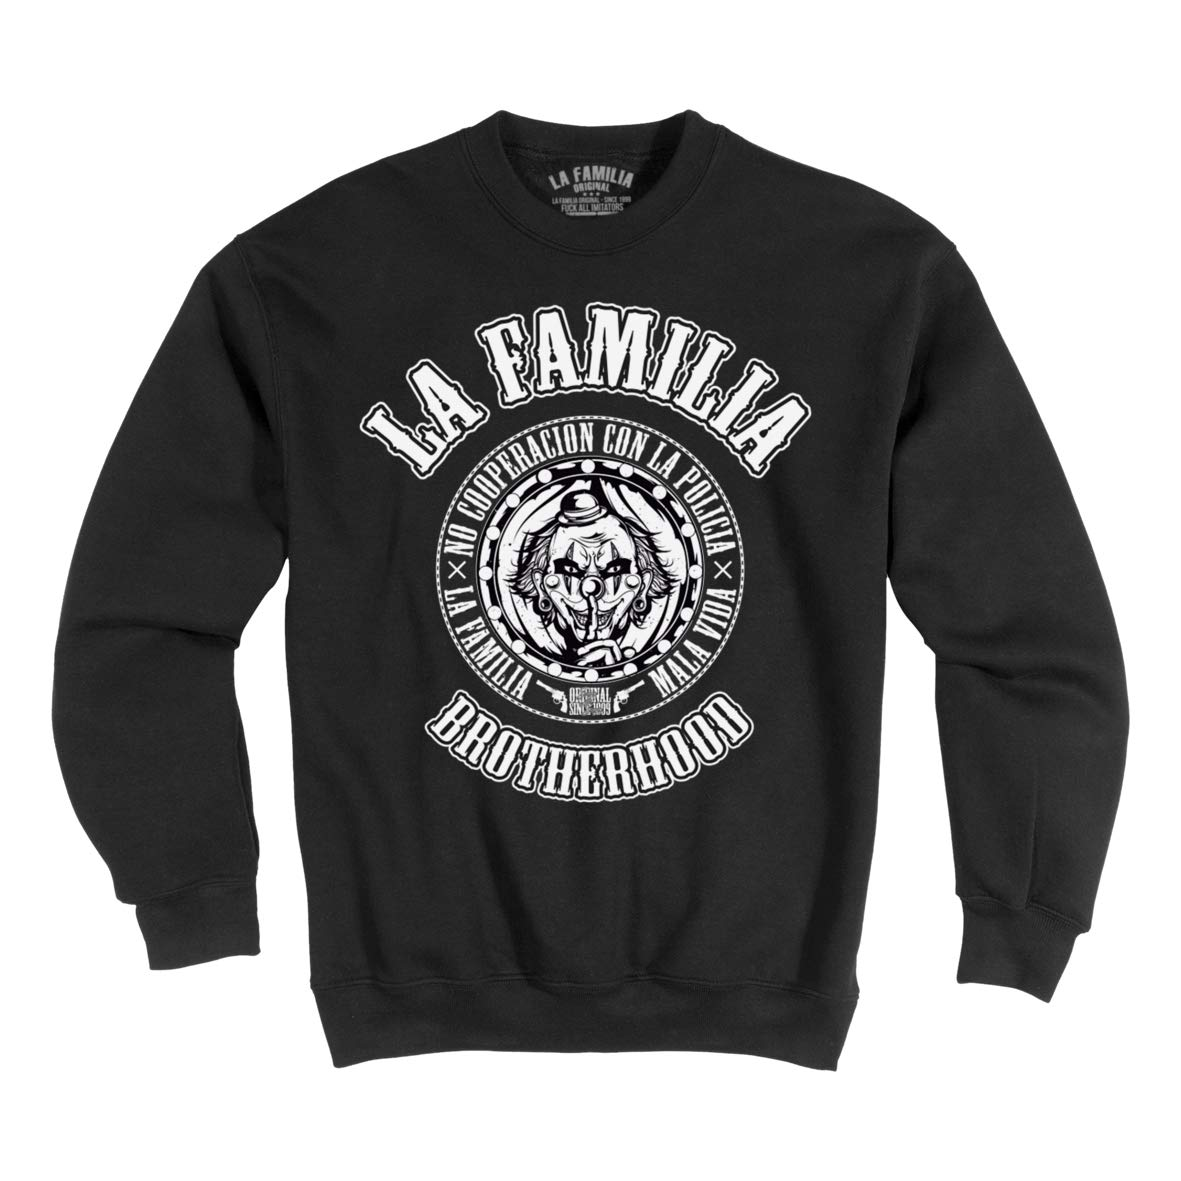 Mi Barrio LA Familia ORIGINAL NOCOP Brotherhood Herren Sweatshirt SCHWARZ (XXL)